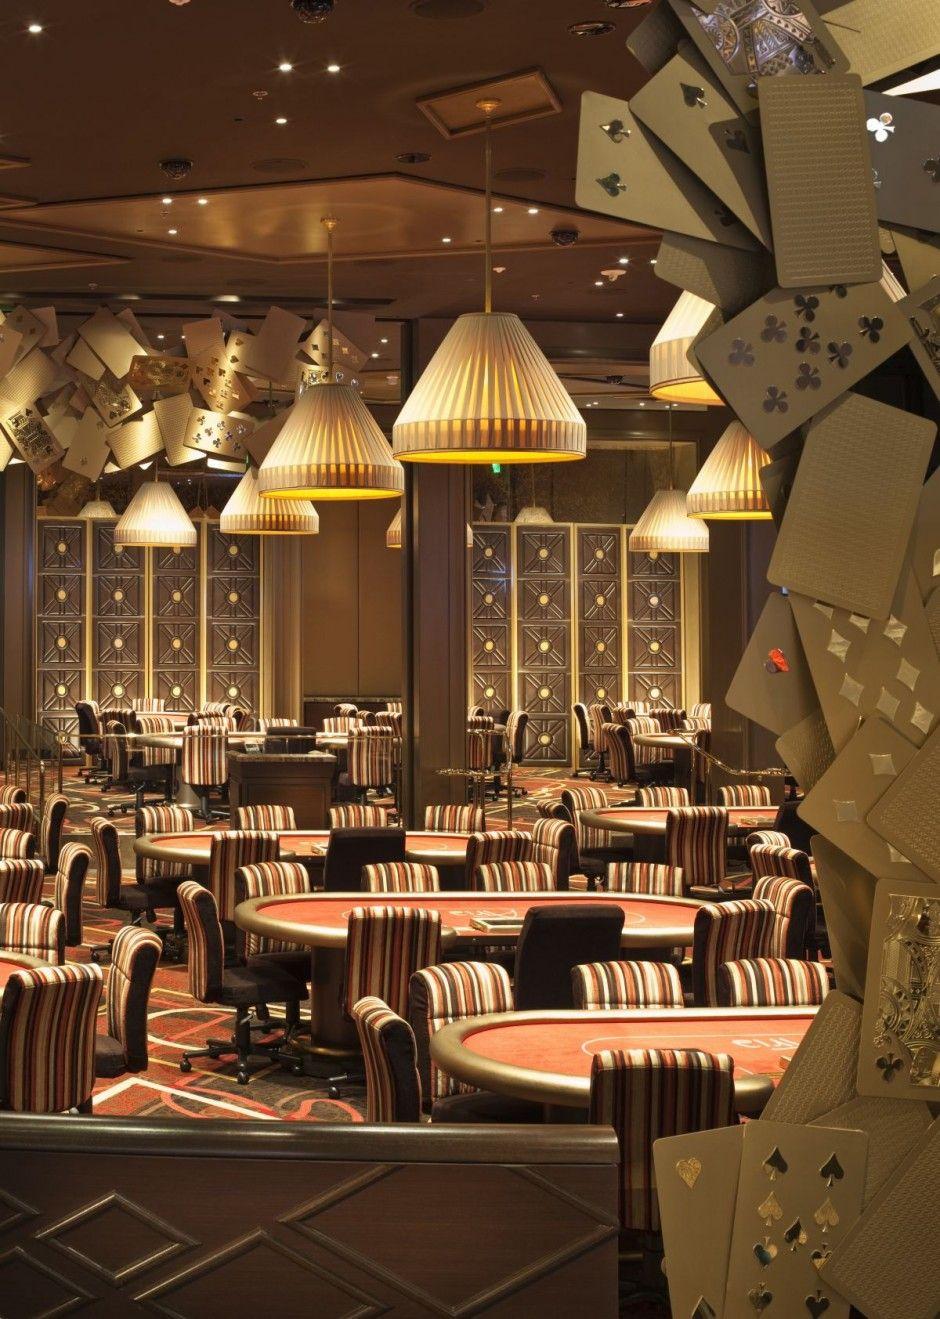 The ARIA Resort Casino Design By Pelli Clarke Architects